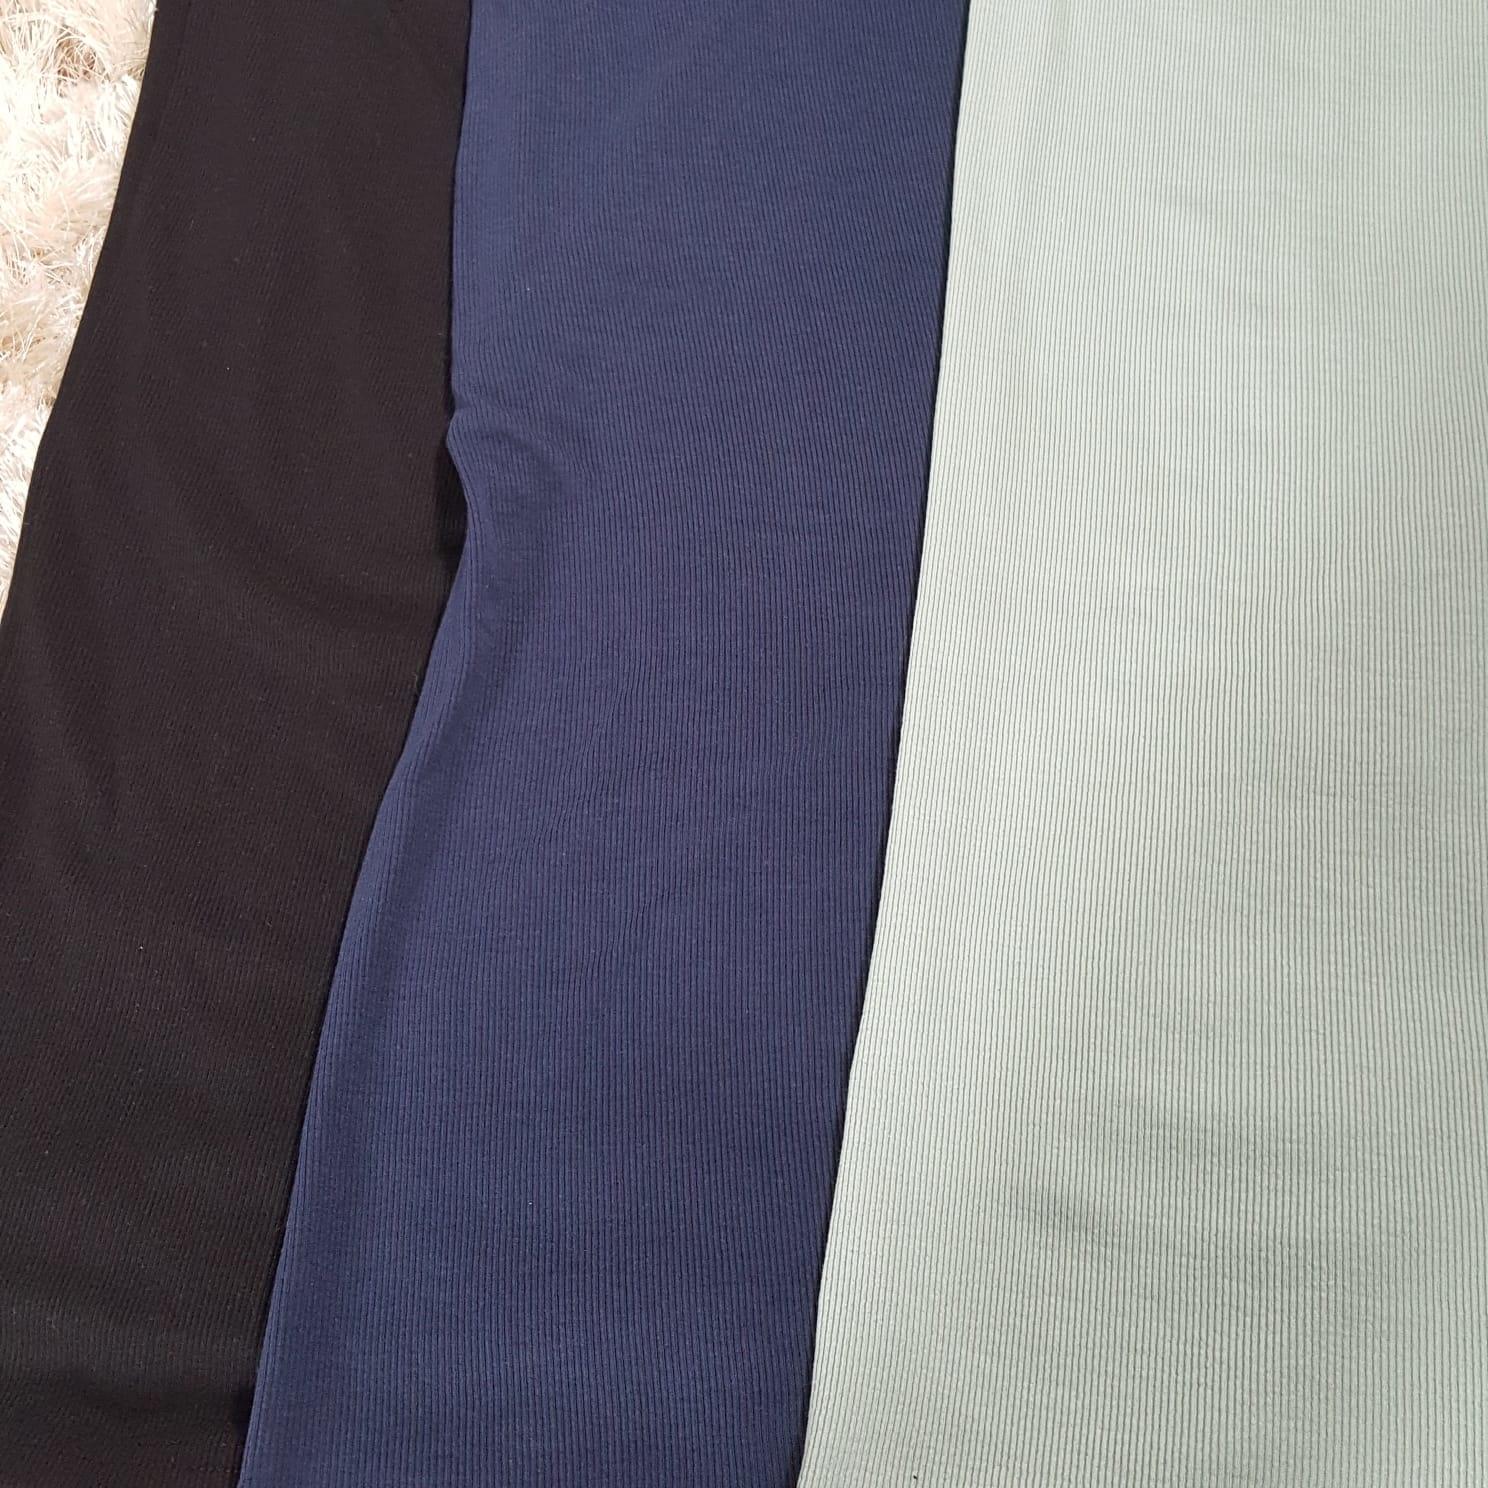 Rok gabicce blue - Copy